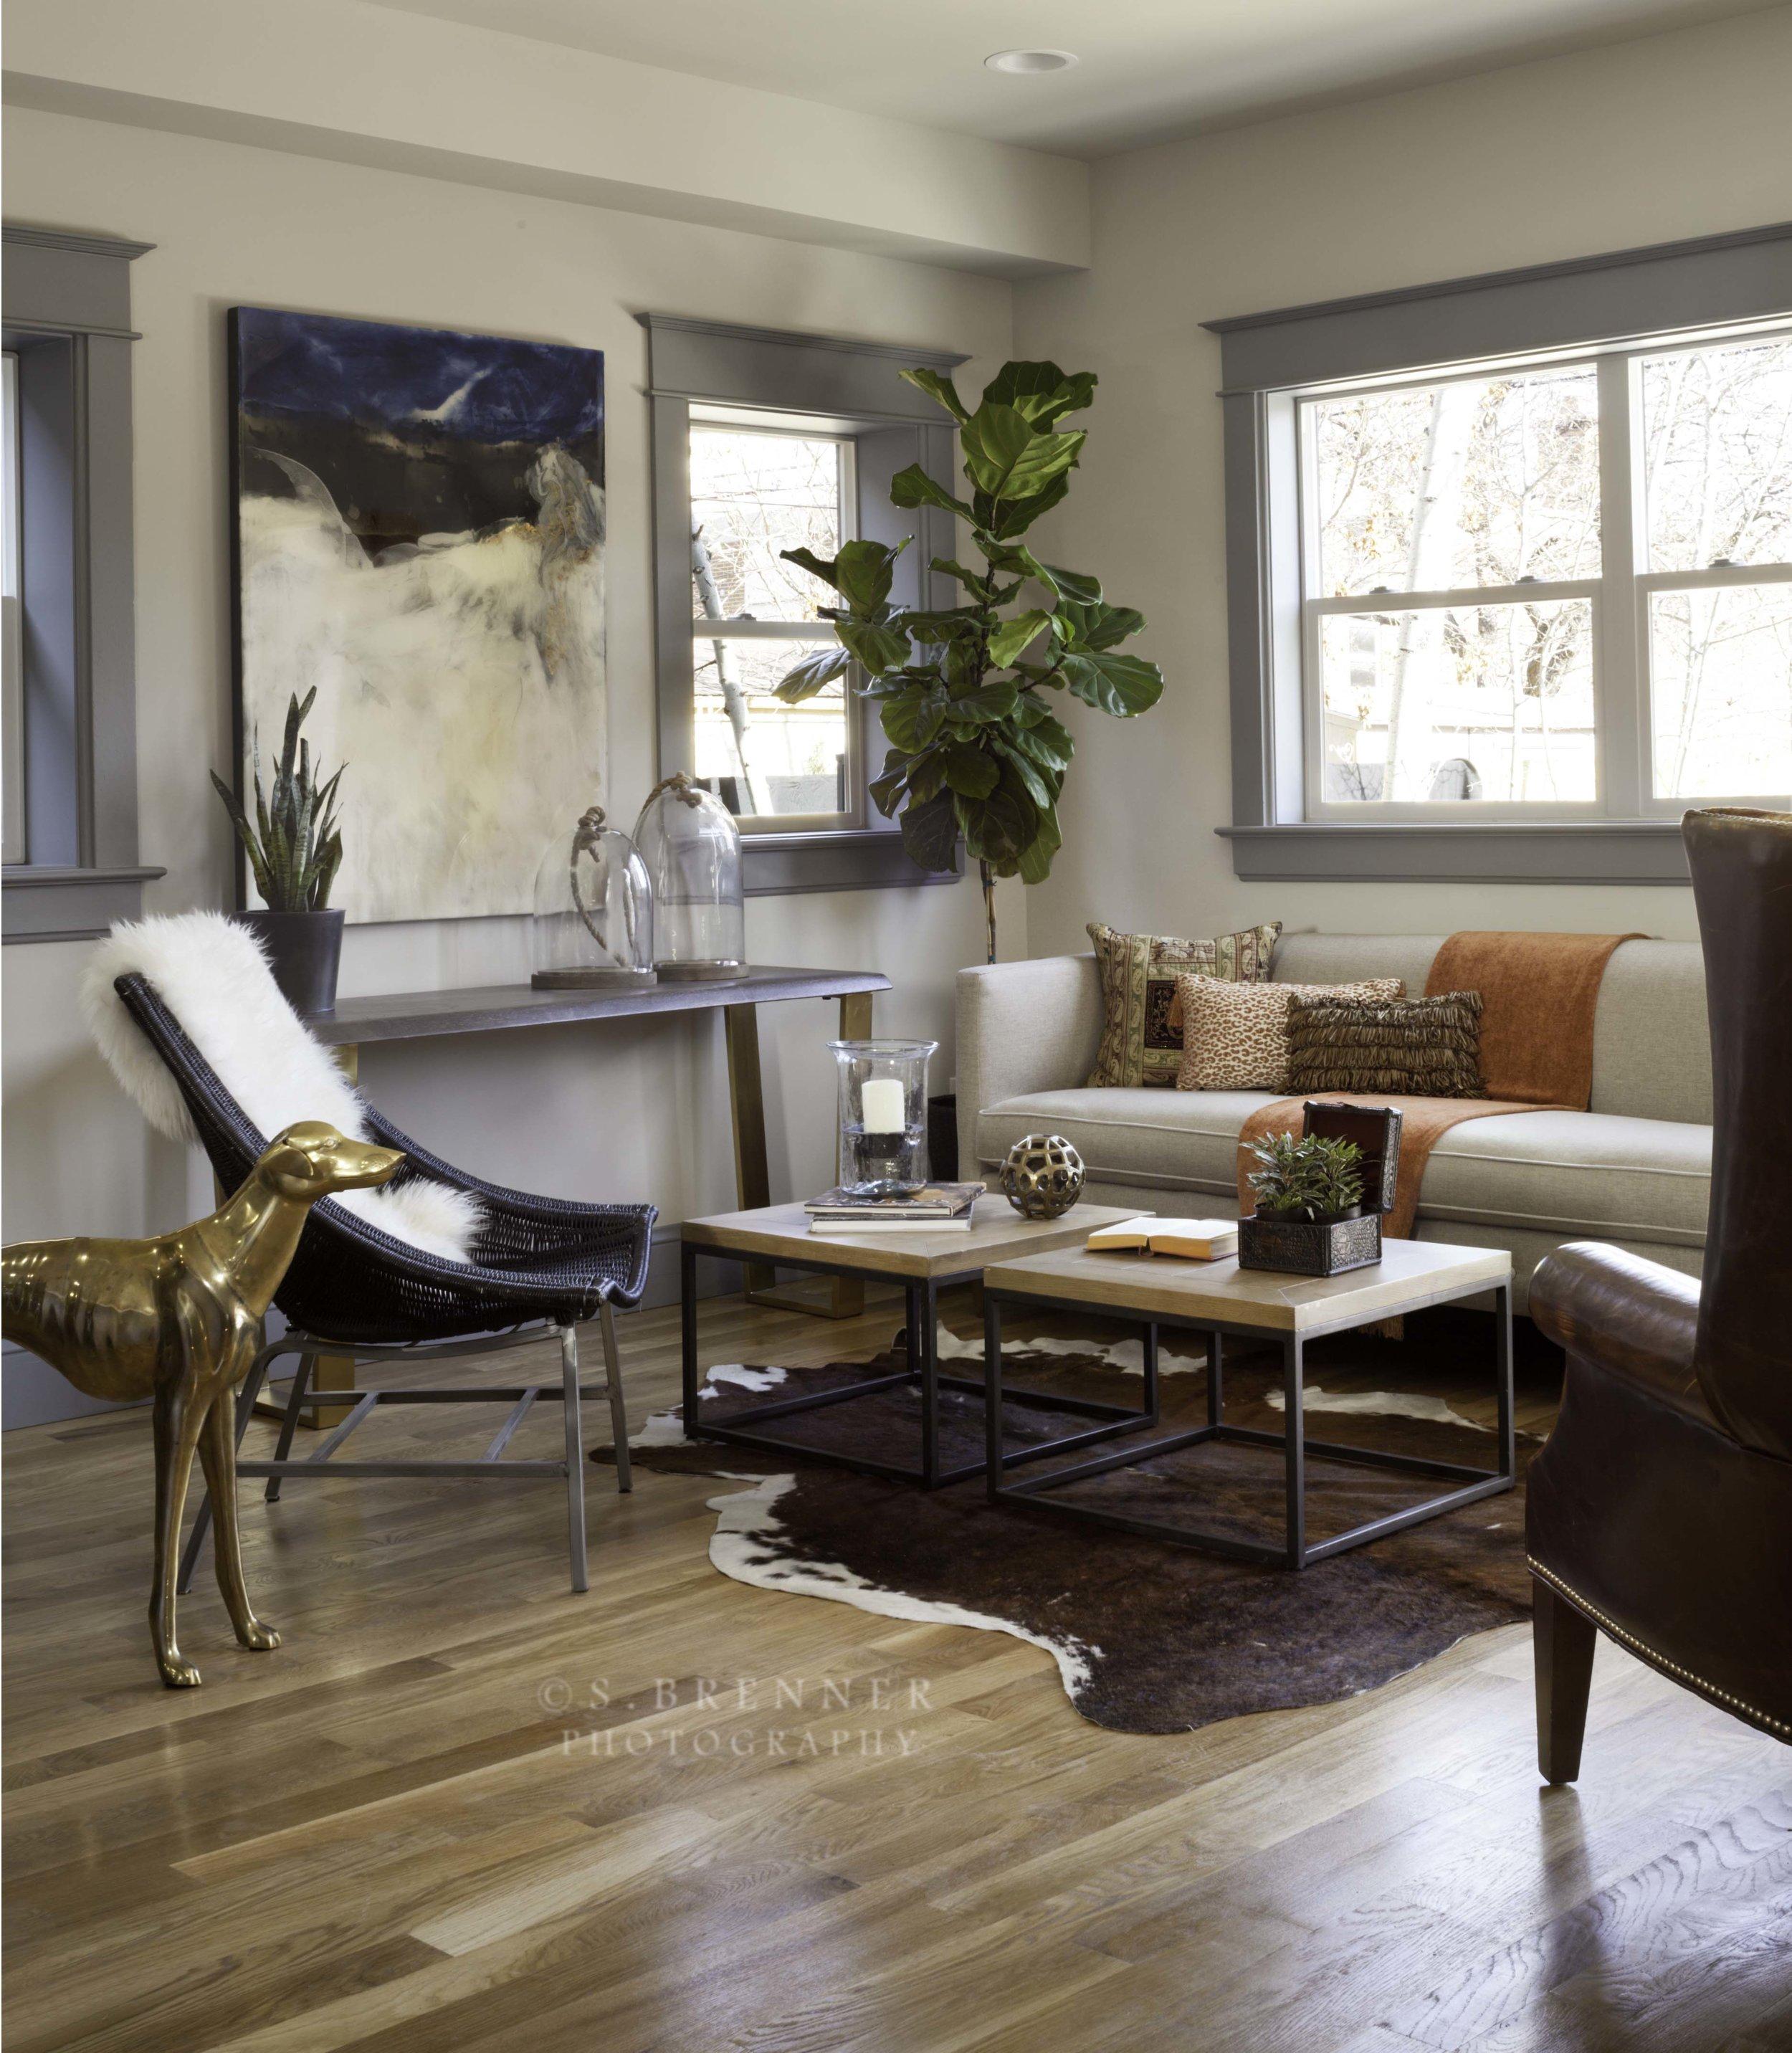 Private Residence. Design: Kim Layne Interiors. S. Brenner Photography. Artist: Patricia Finley.